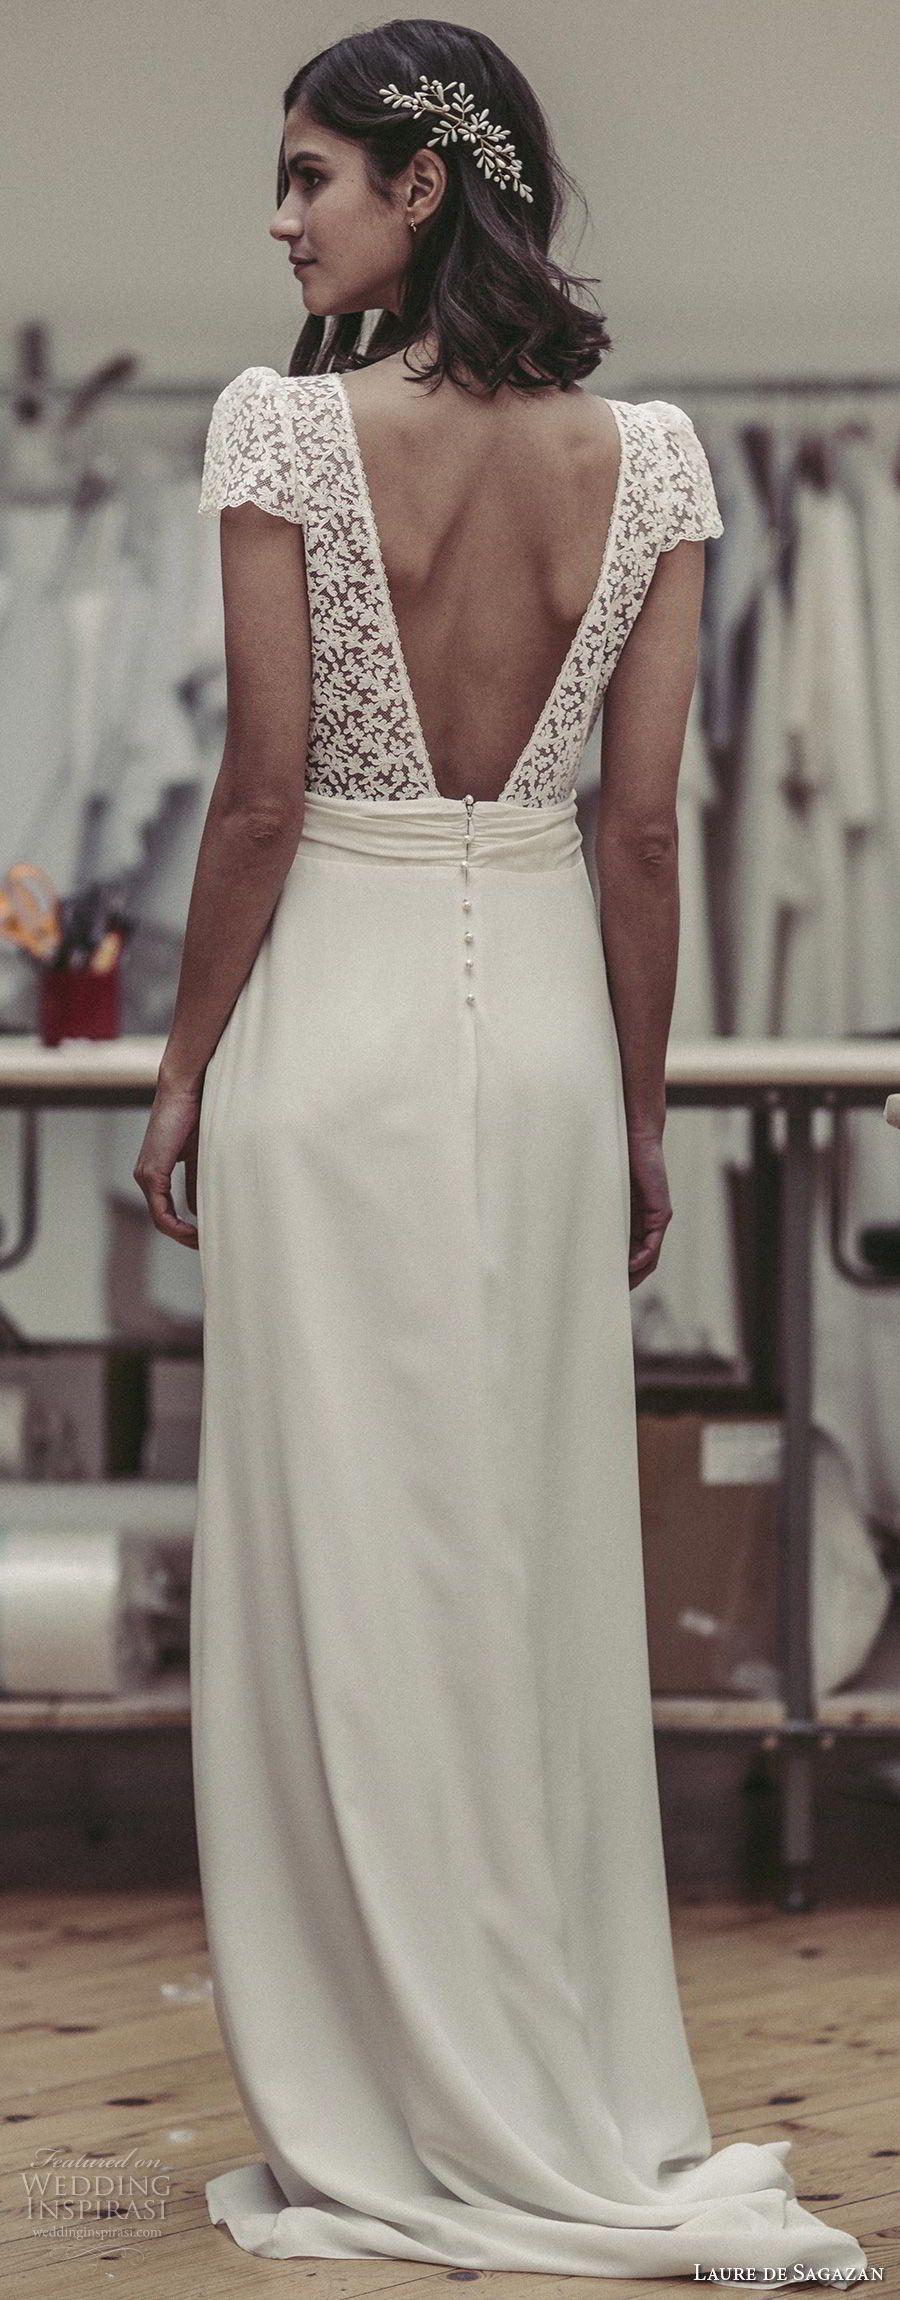 Laure de sagazan wedding dresses wedding dress wedding and